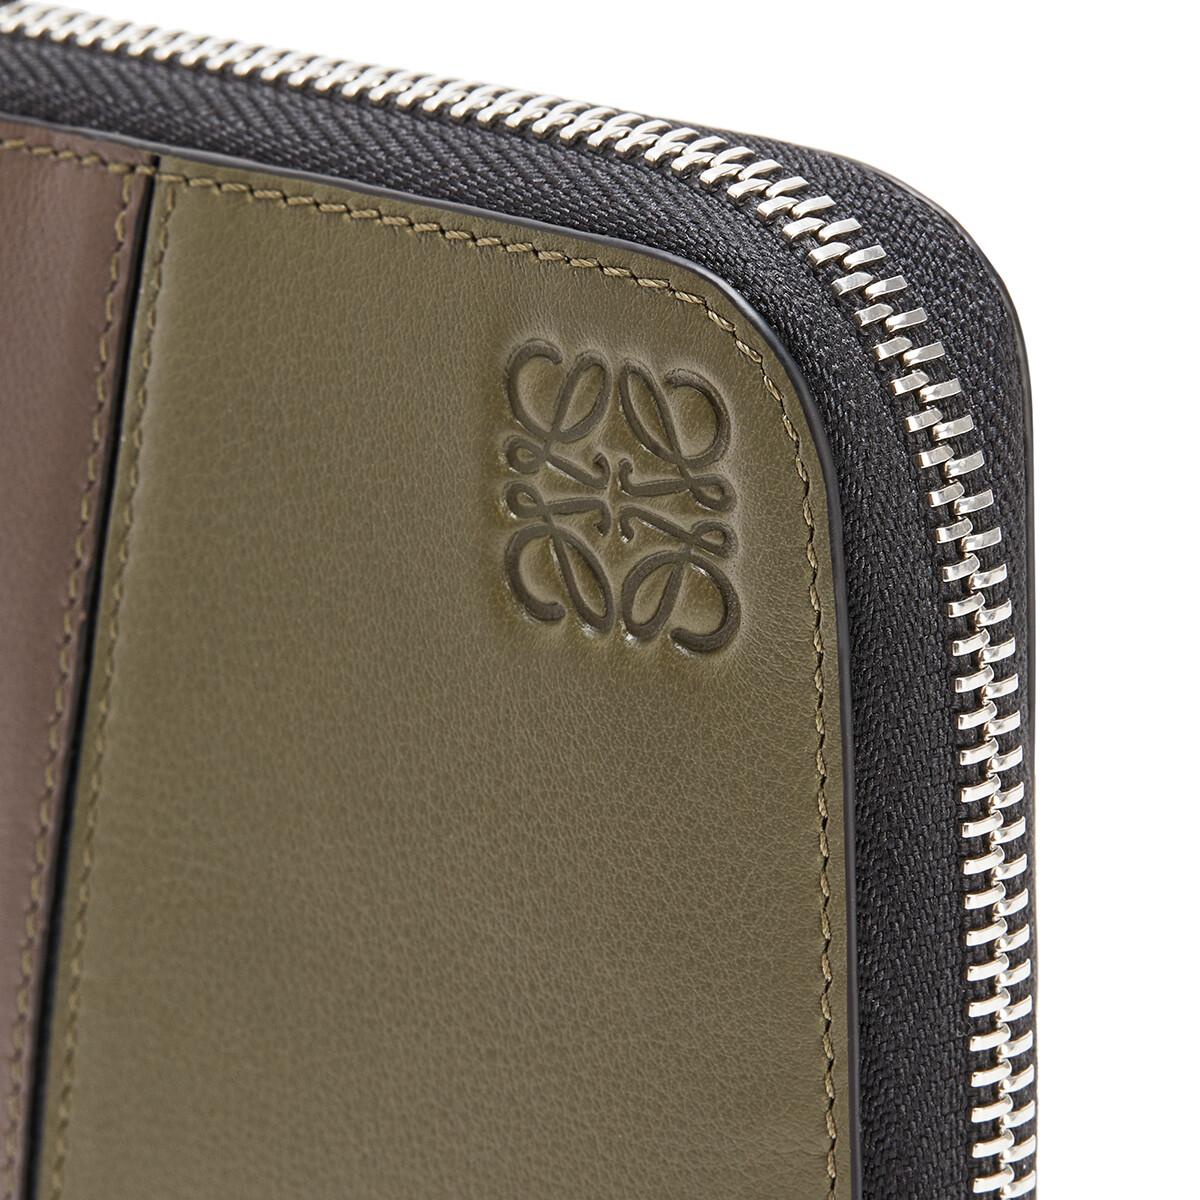 LOEWE Puzzle Open Wallet Khaki Green/Ochre front